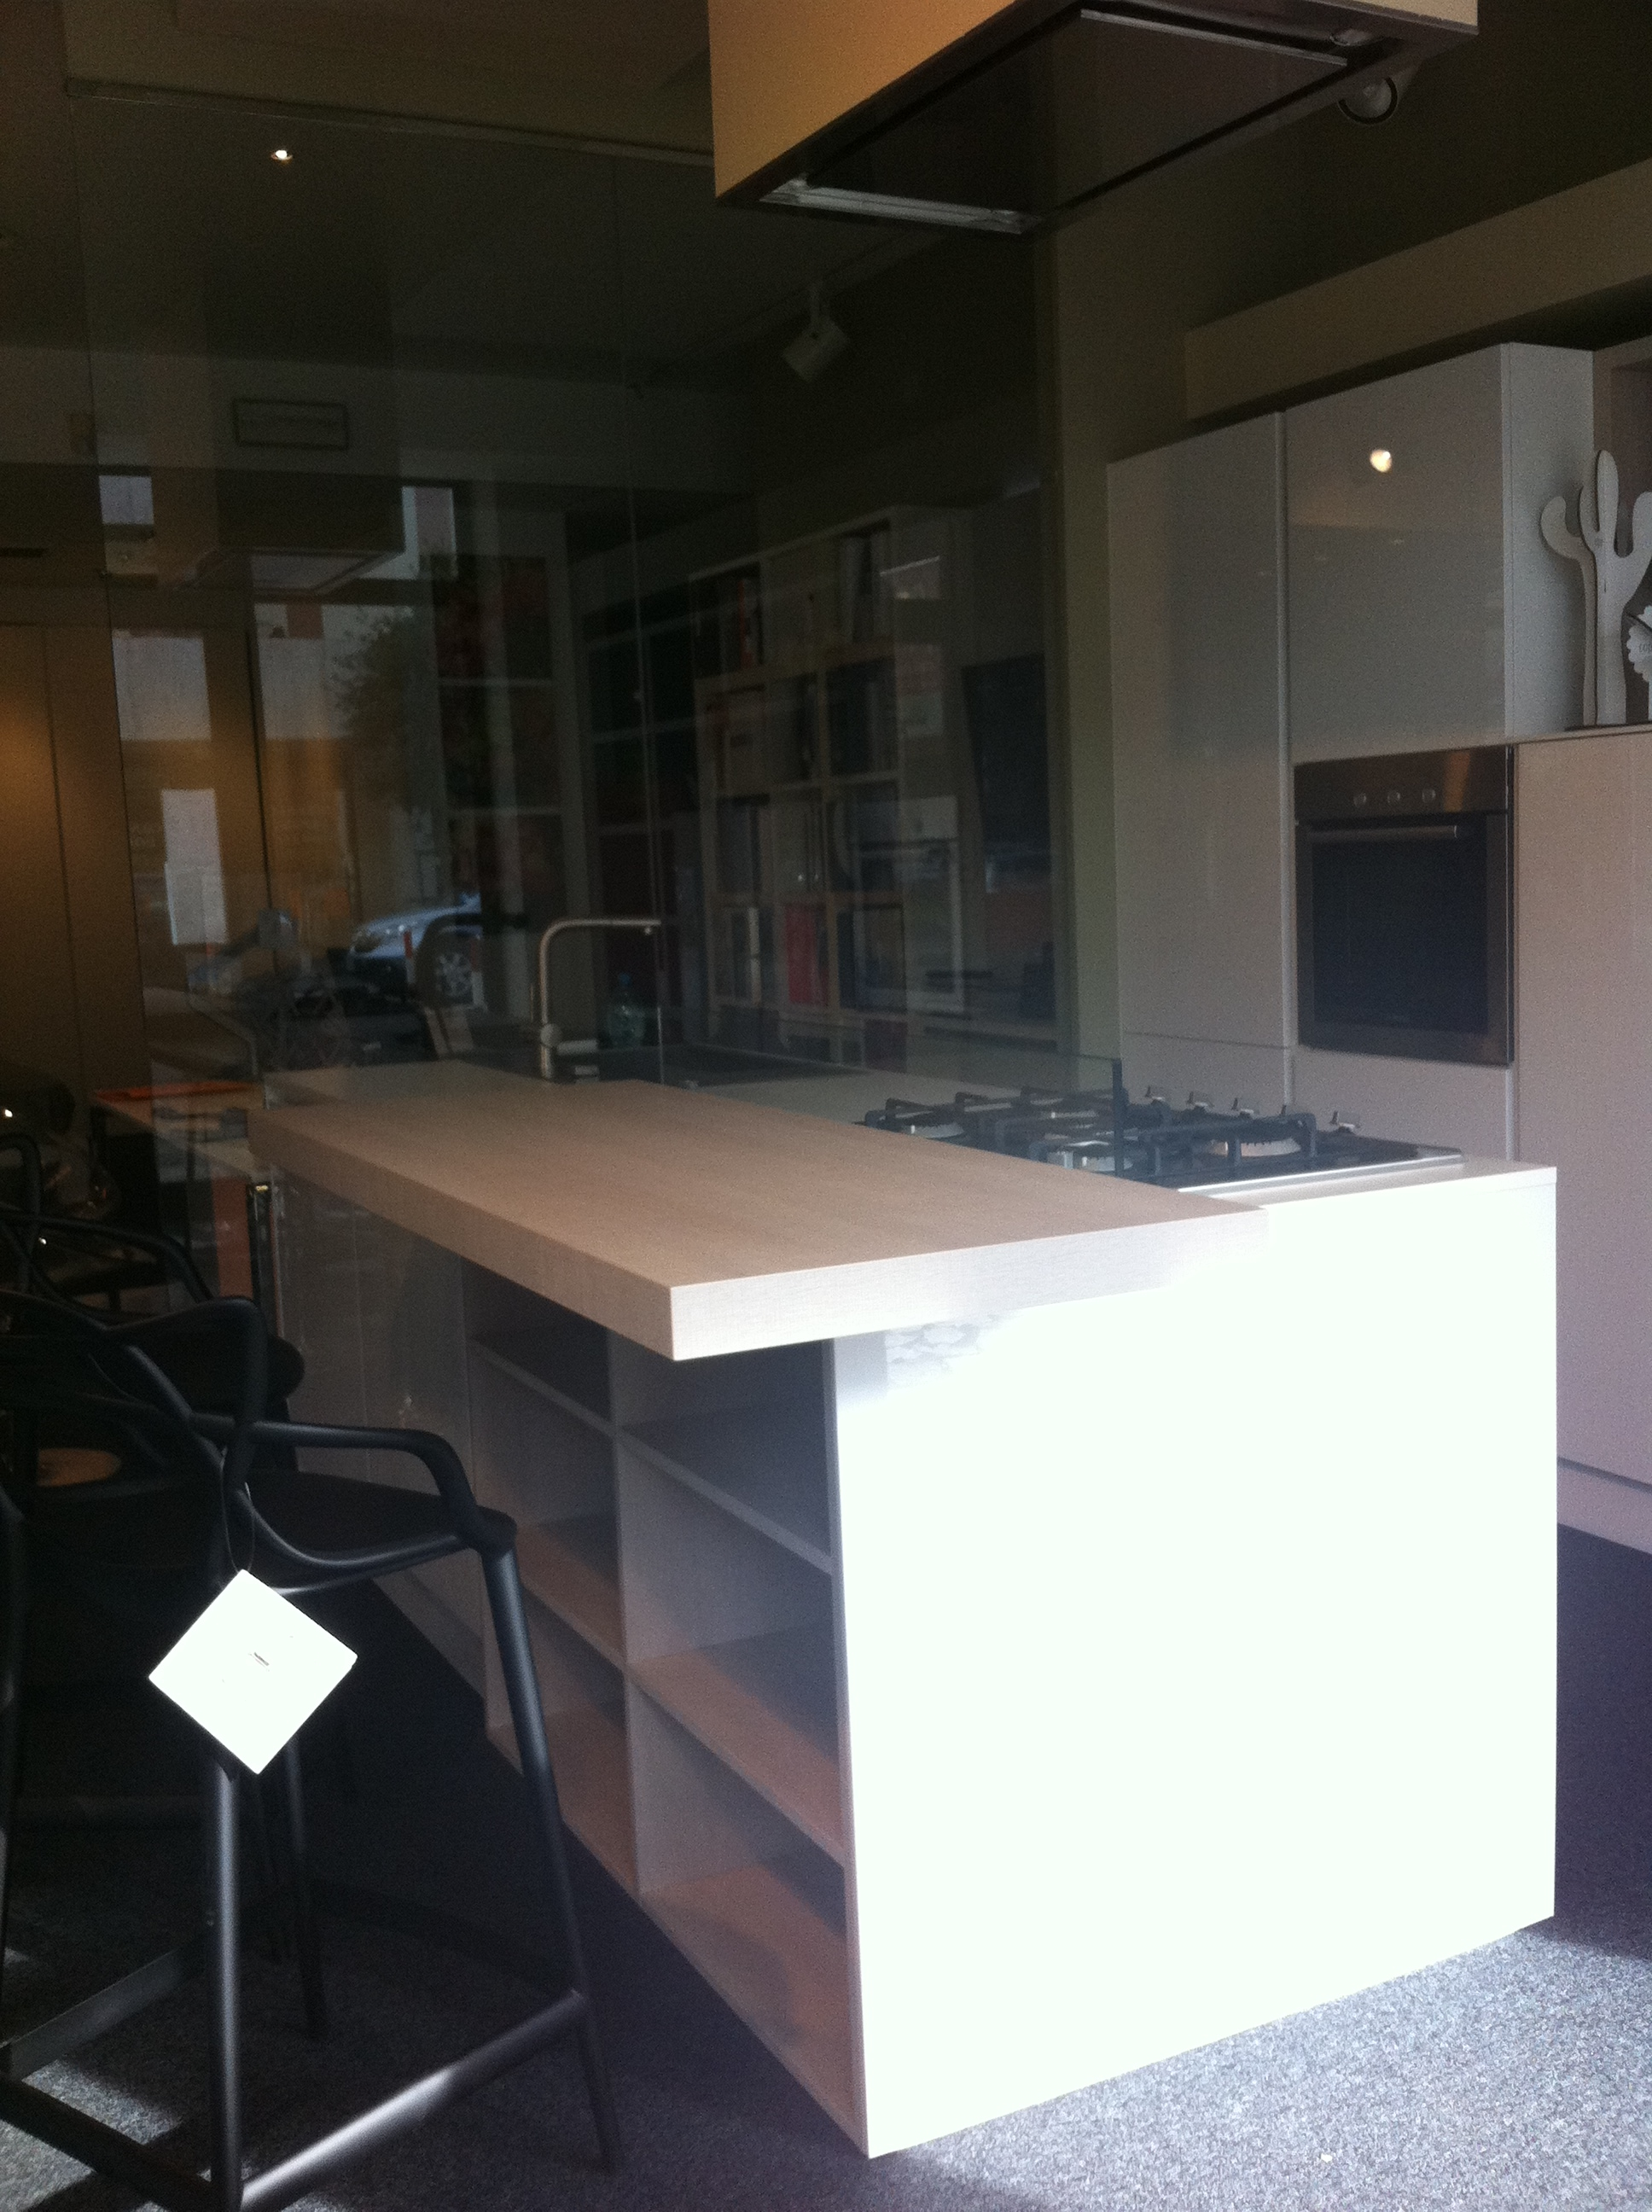 Cucina con penisola e zona libreria cucine a prezzi scontati for Libreria leroy merlin